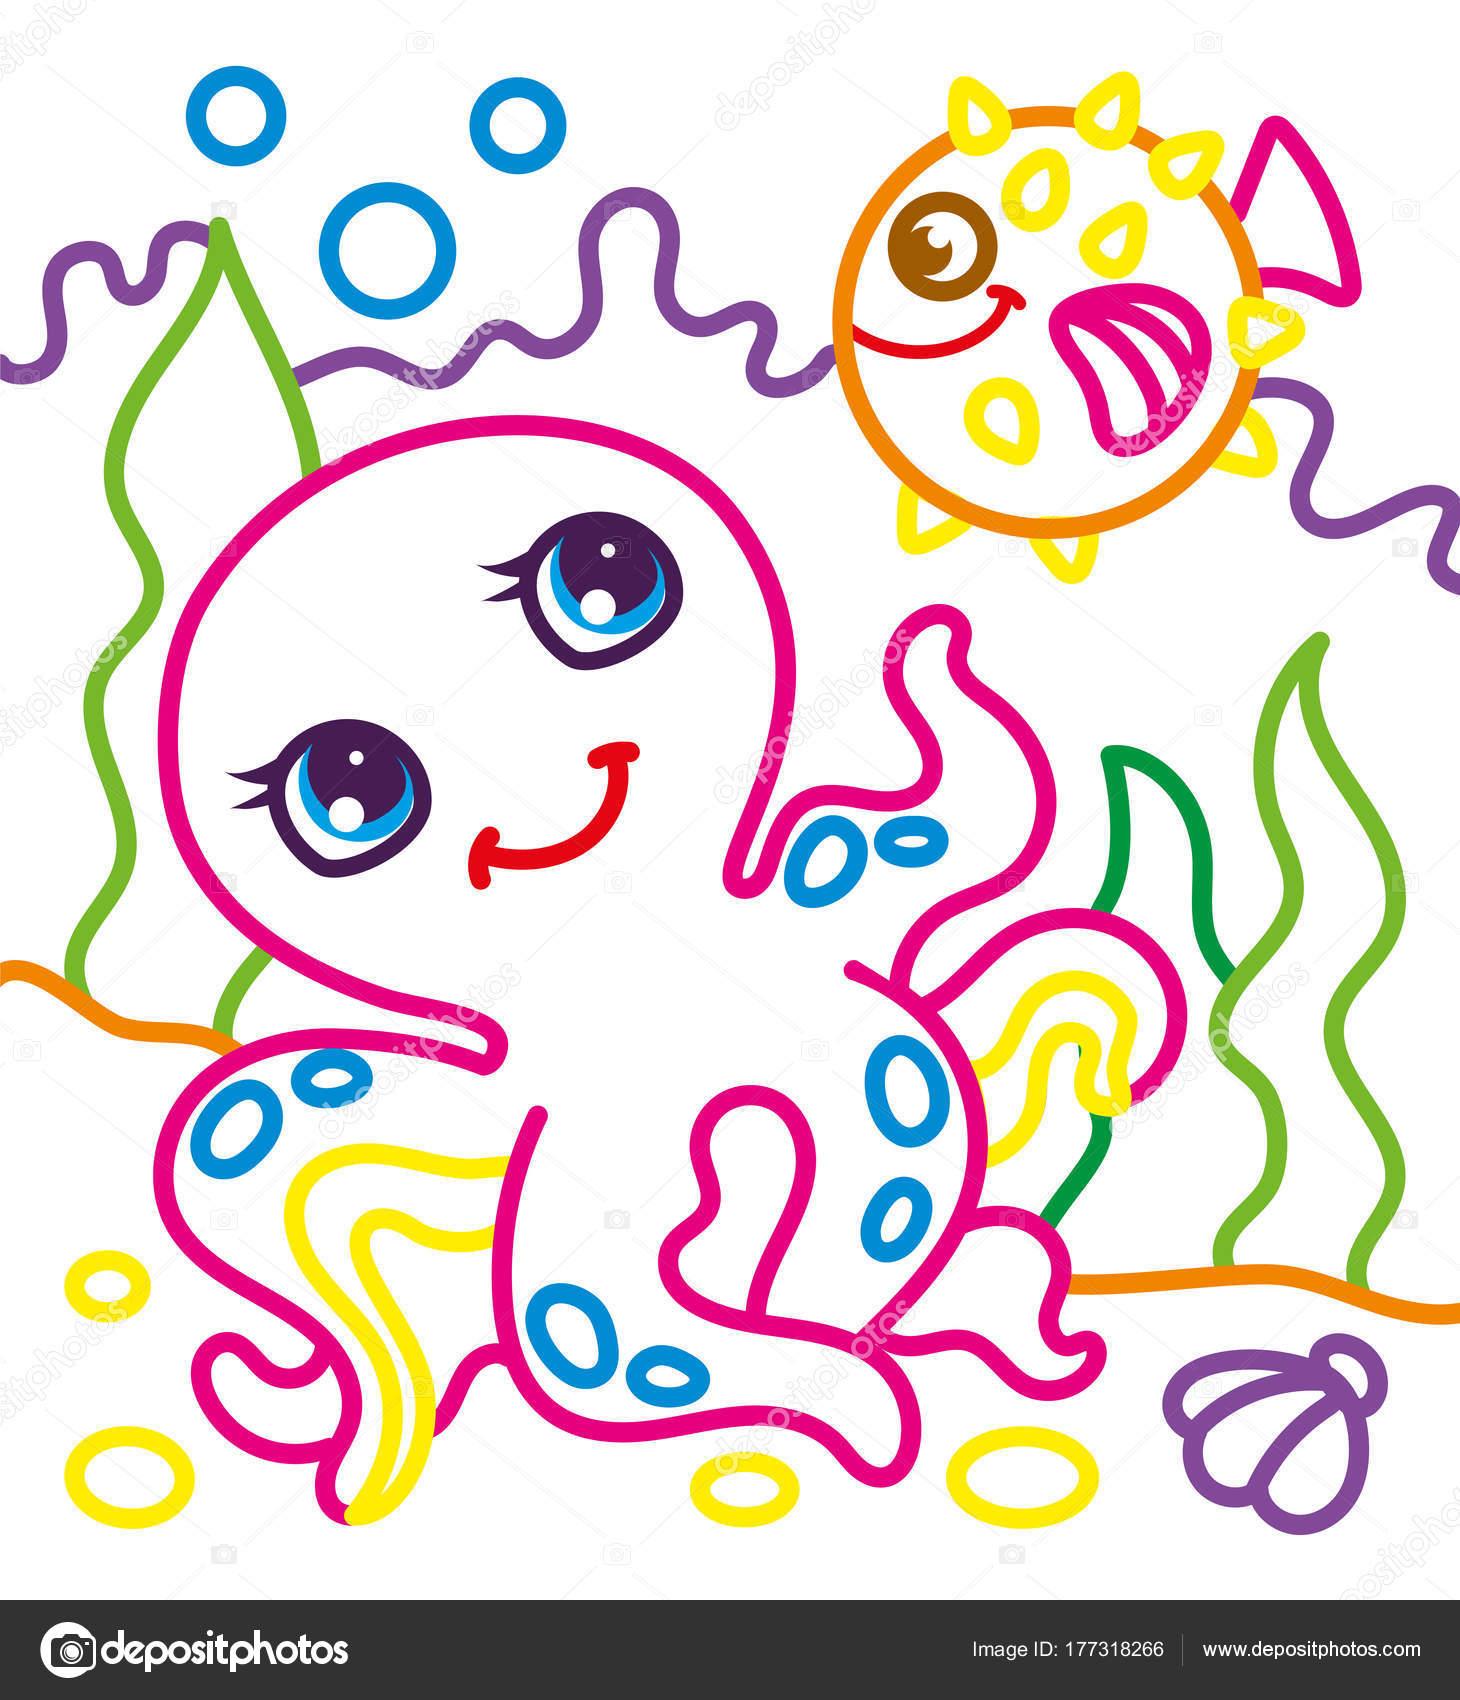 Kleurplaat Boek Van Octopus Met Vis Stockvector C Ingasmk 177318266